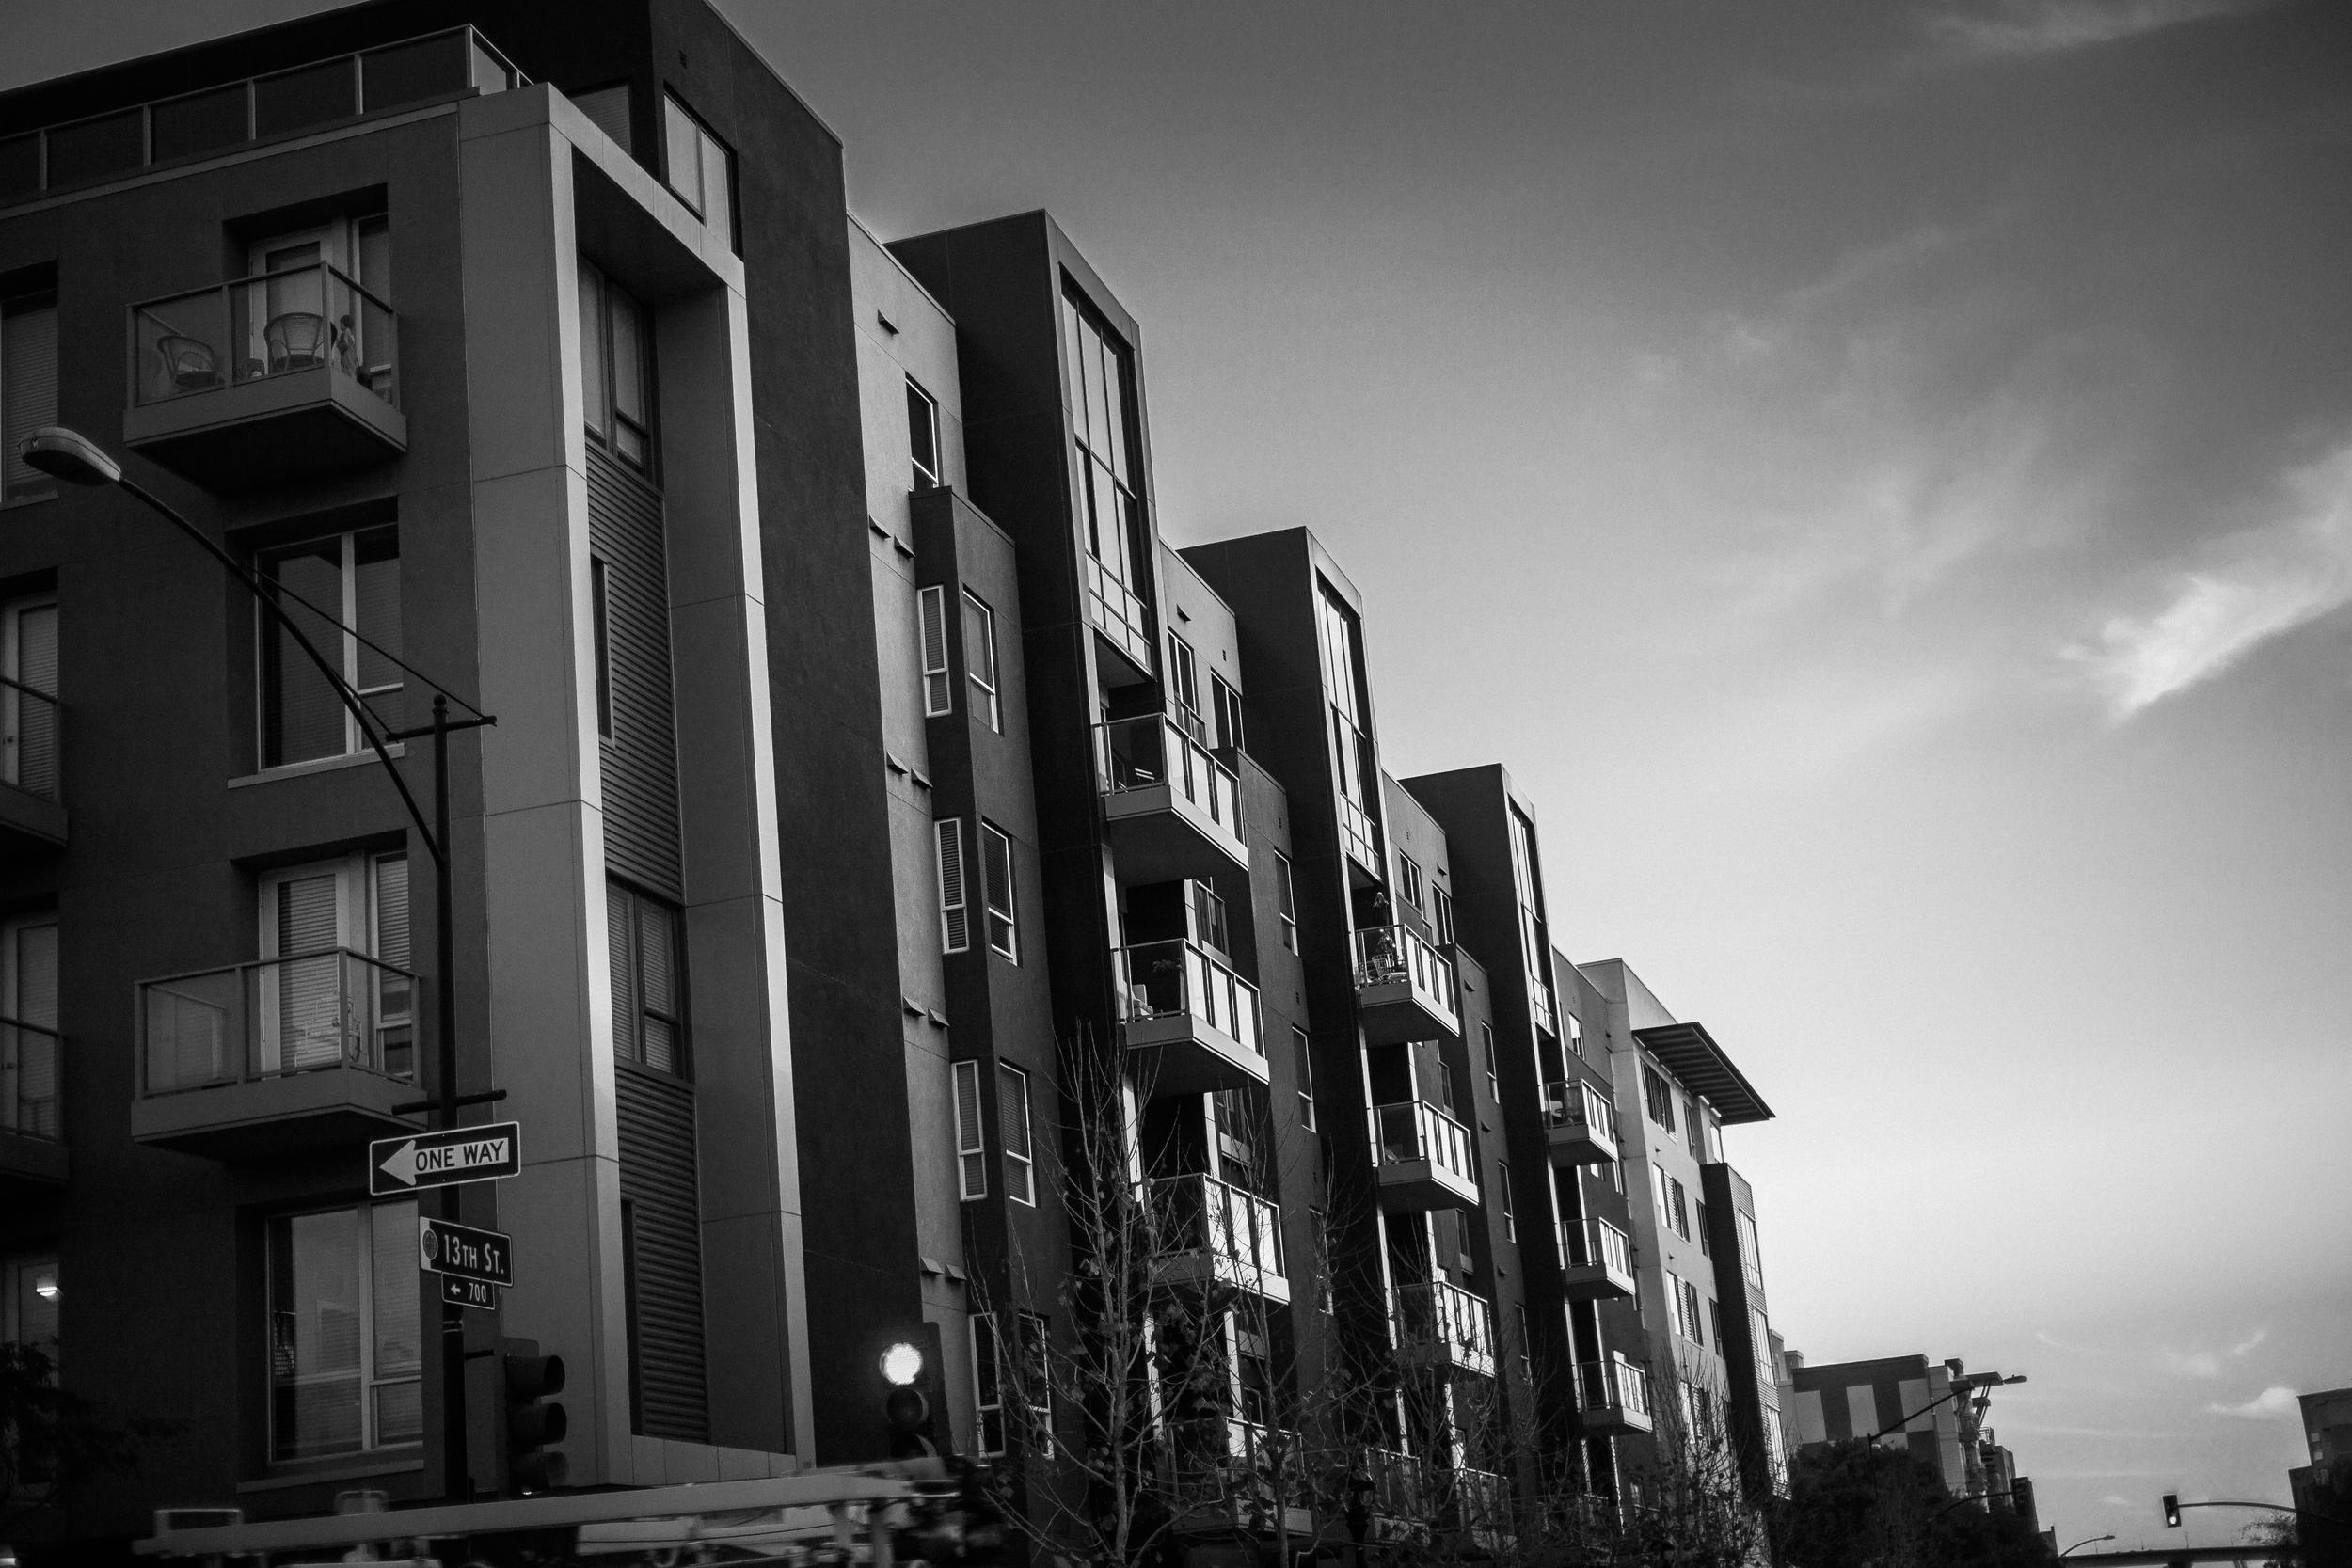 san diego wedding   photographer | monotone shot of apartment units